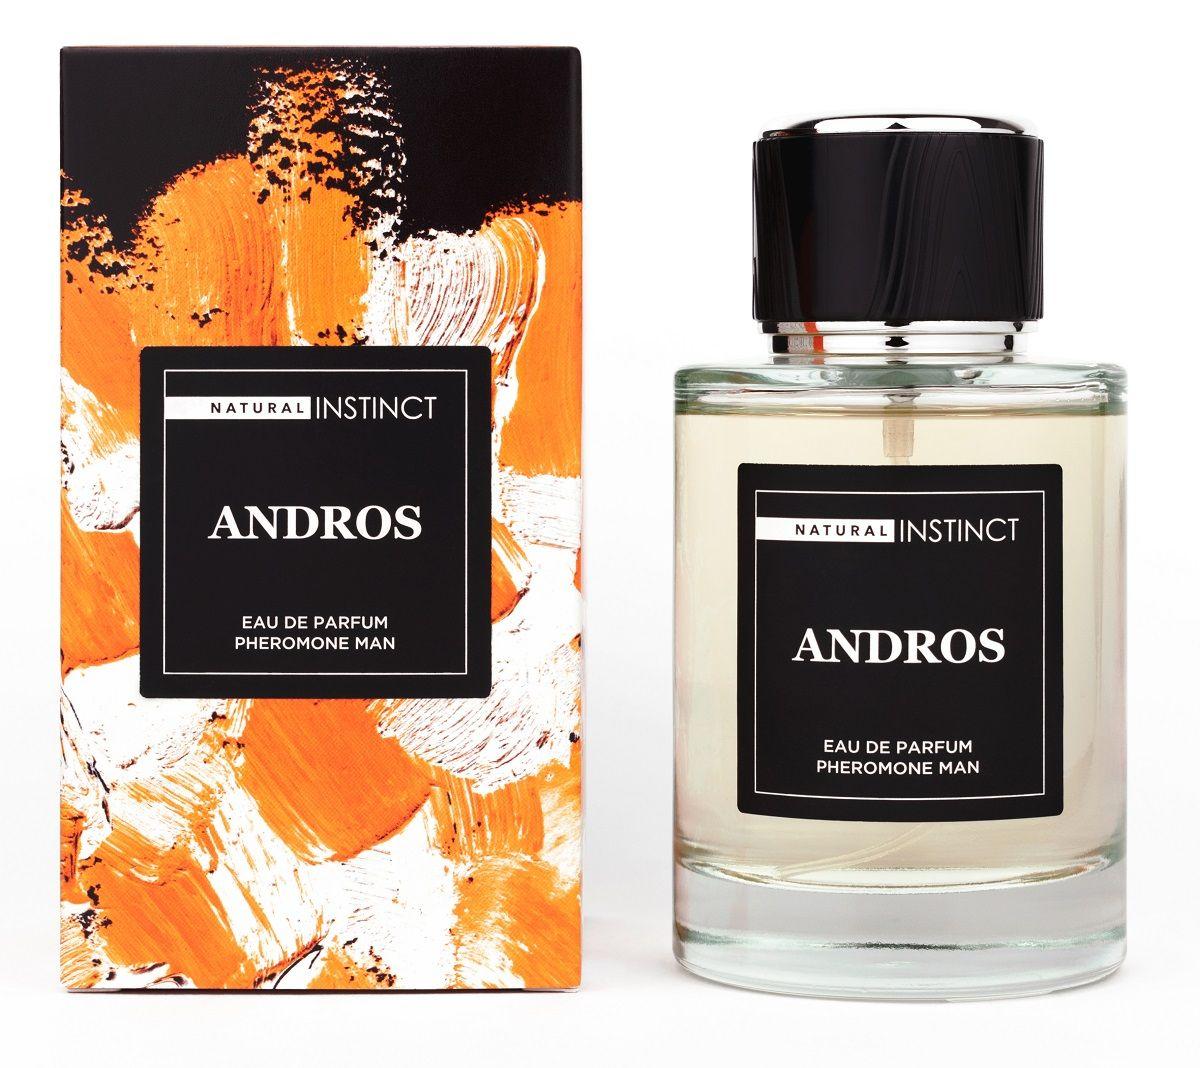 Парфюмерная вода с феромонами Andros - 100 мл.-